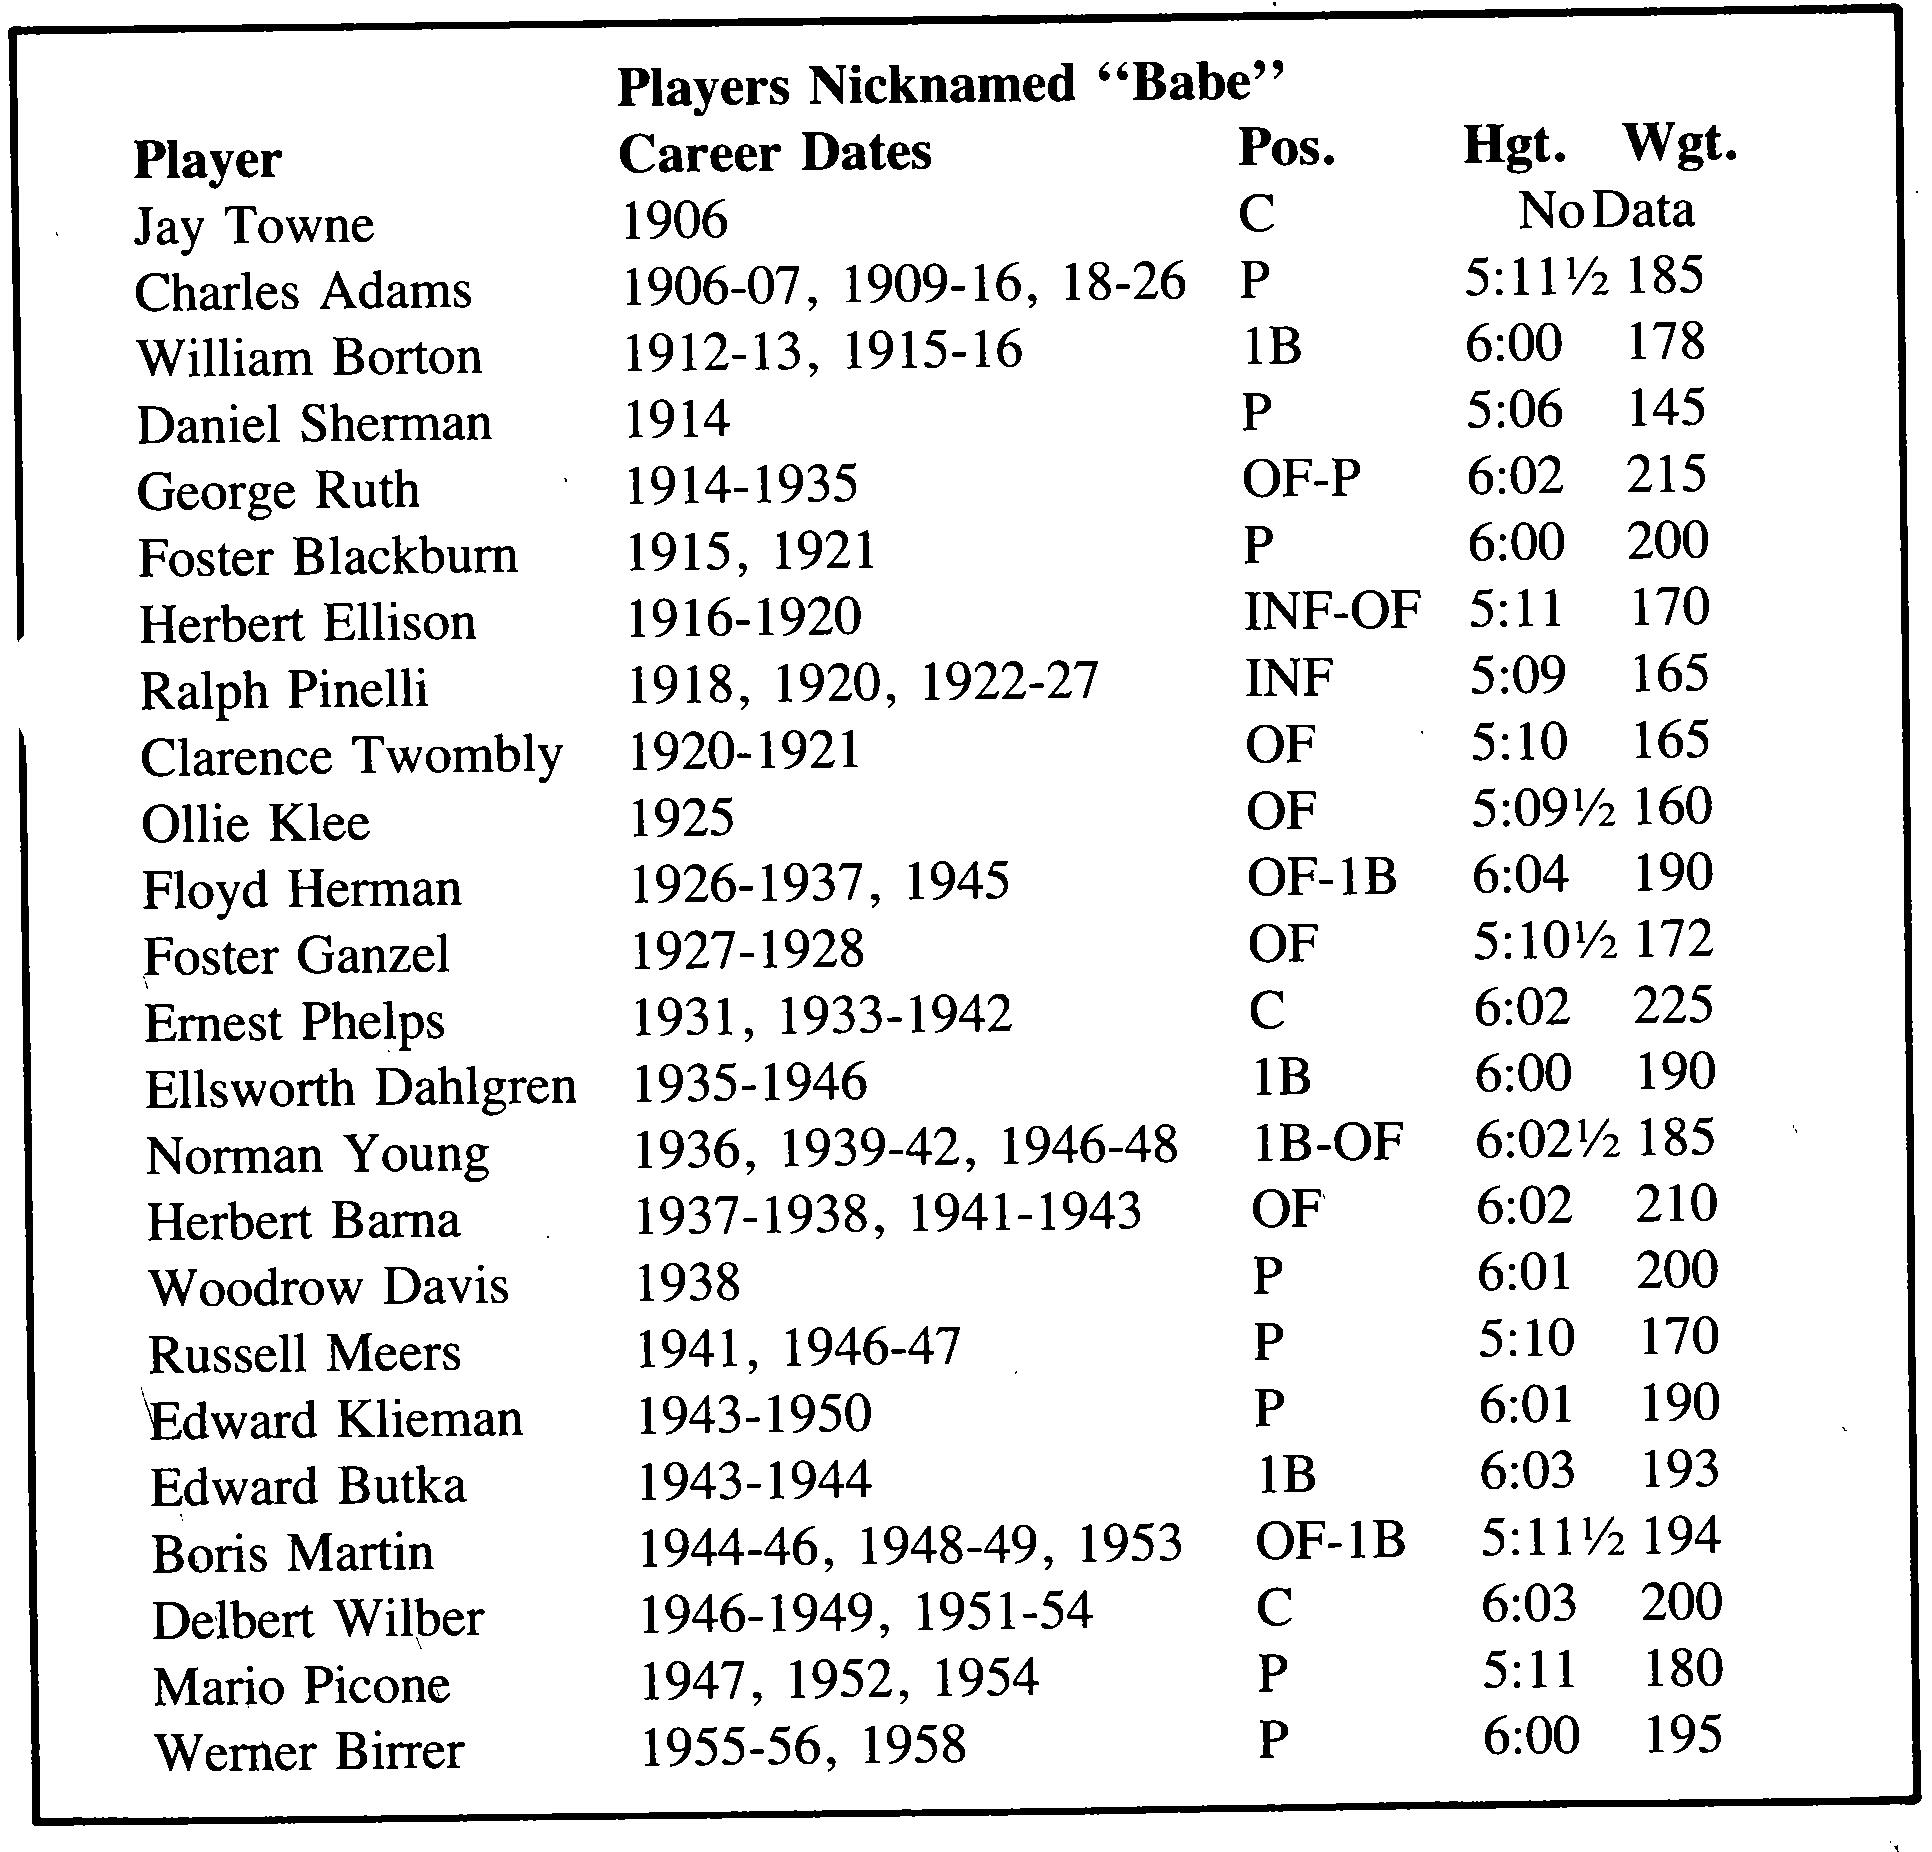 James Skipper: Table 1